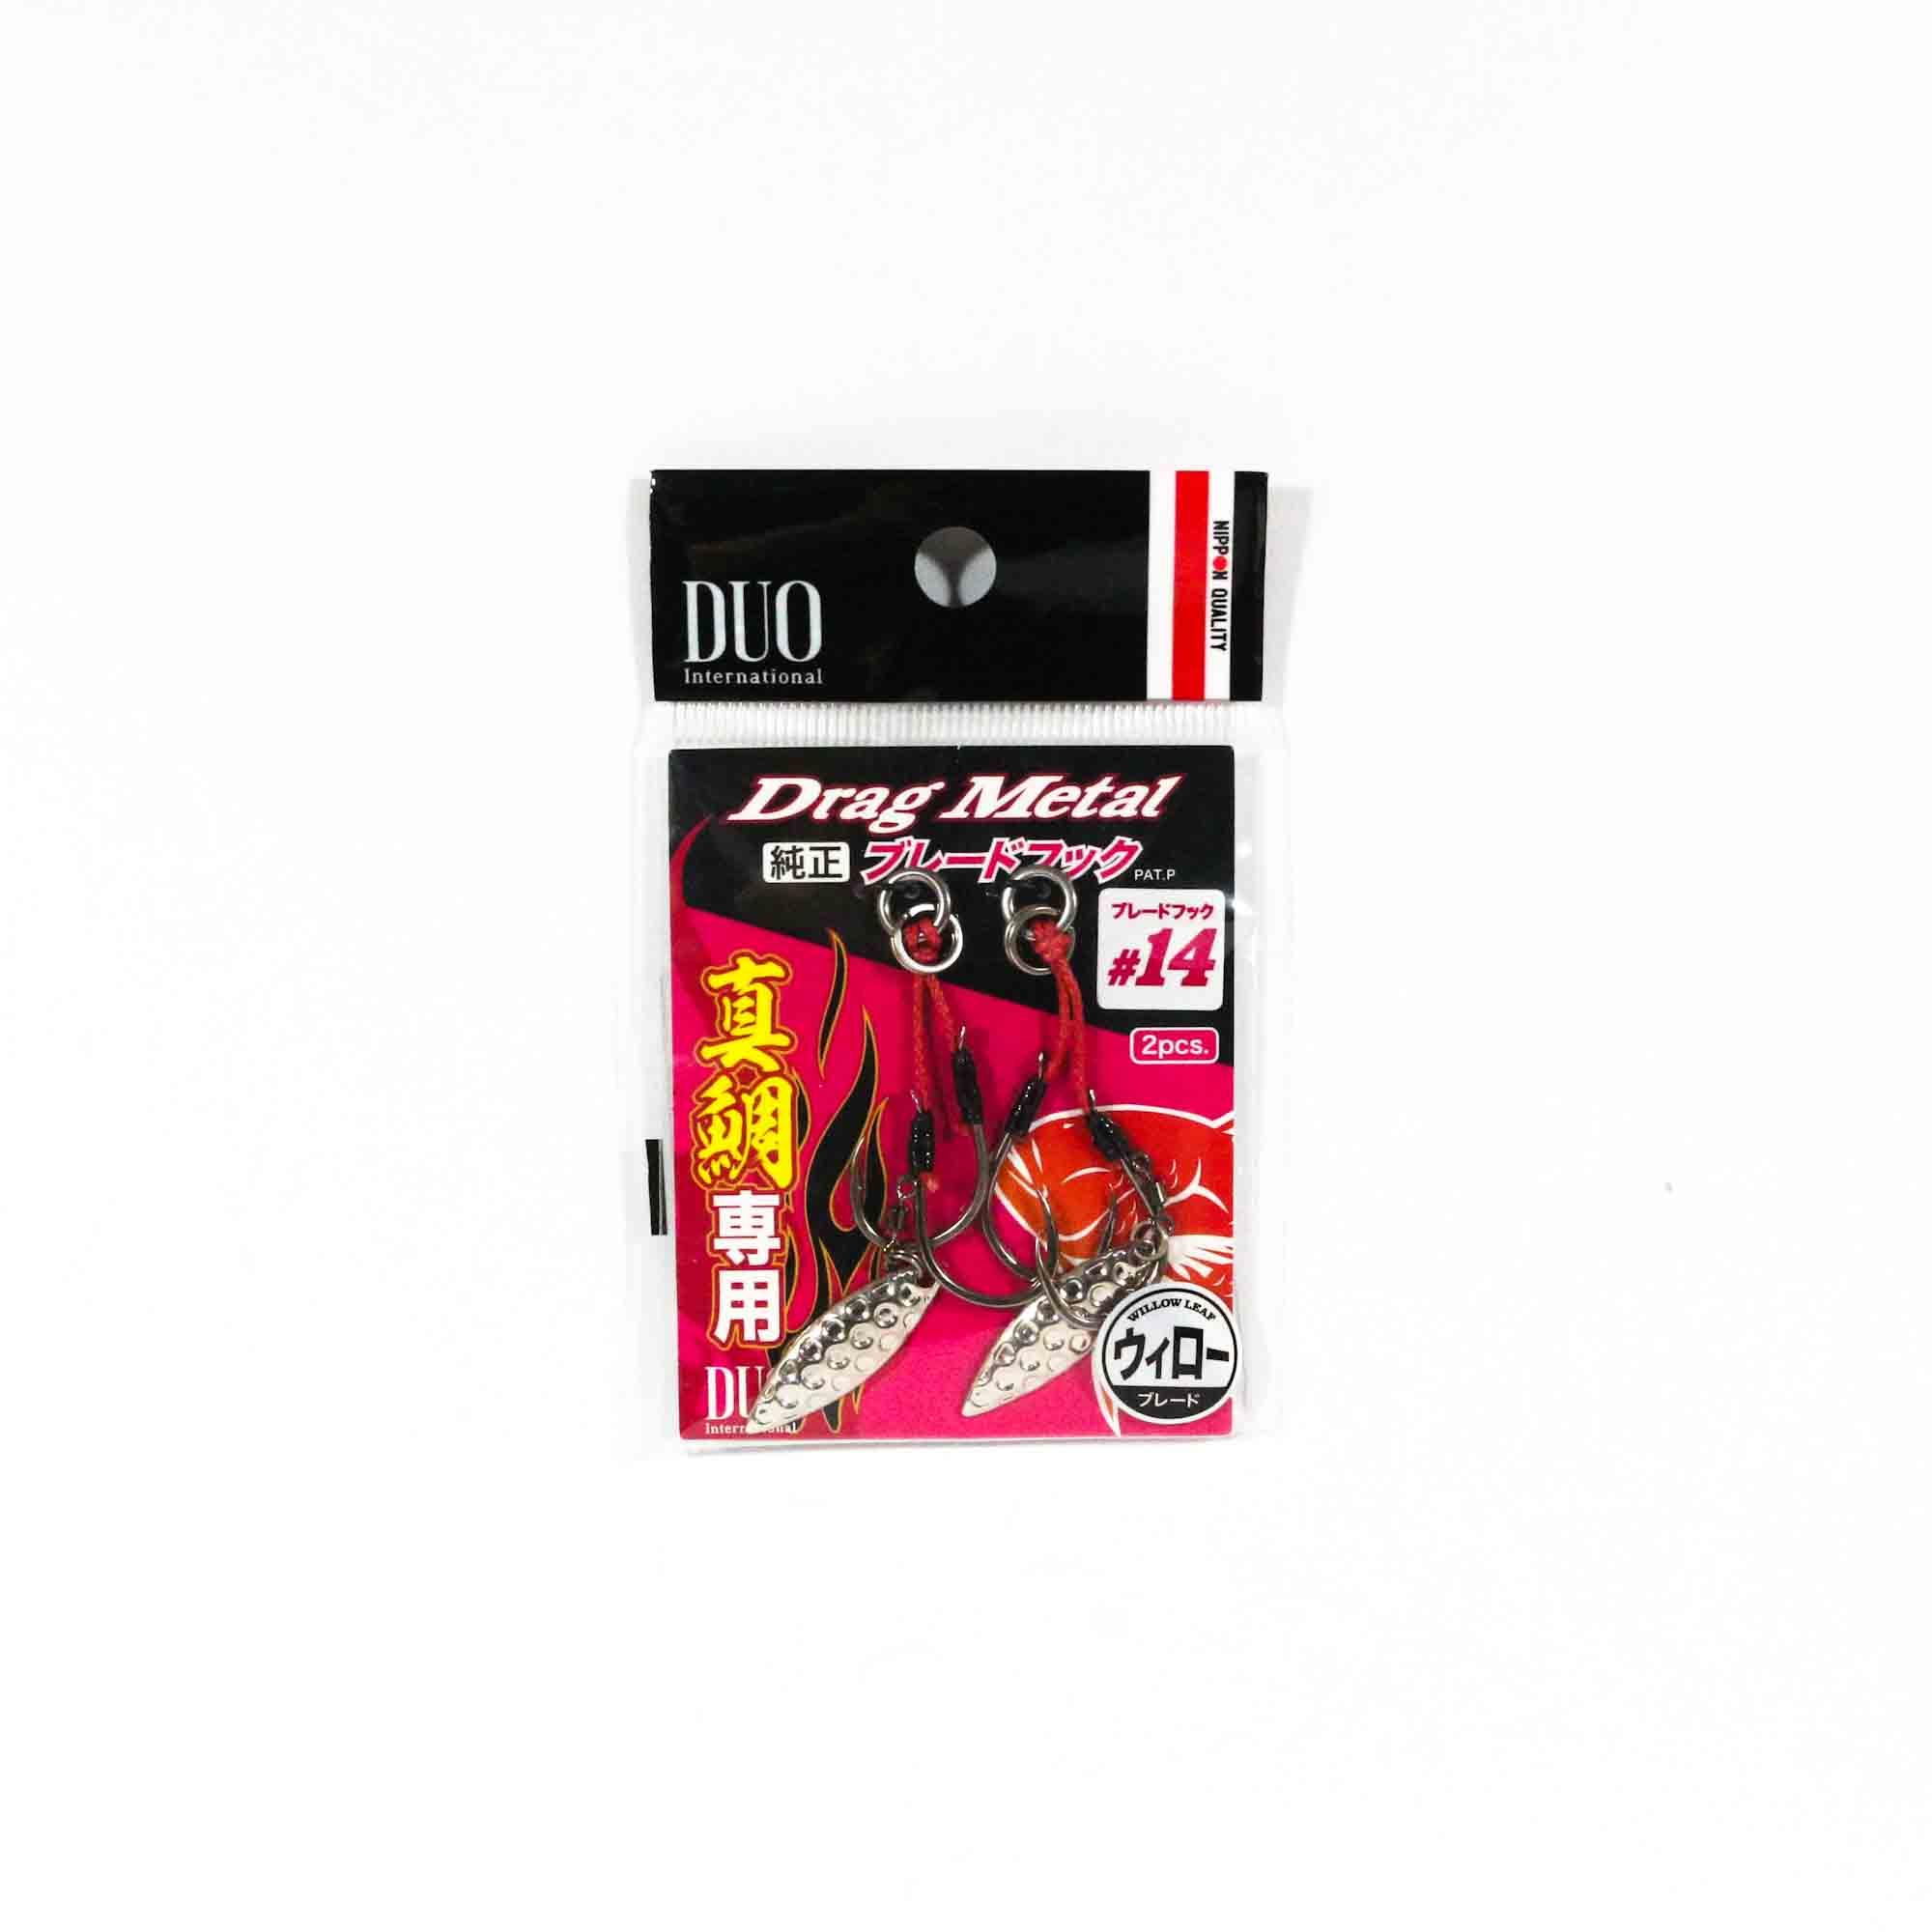 Duo Assist Hooks Drag Metal DC-MDW #14, Willow 2 Per pack (8265)